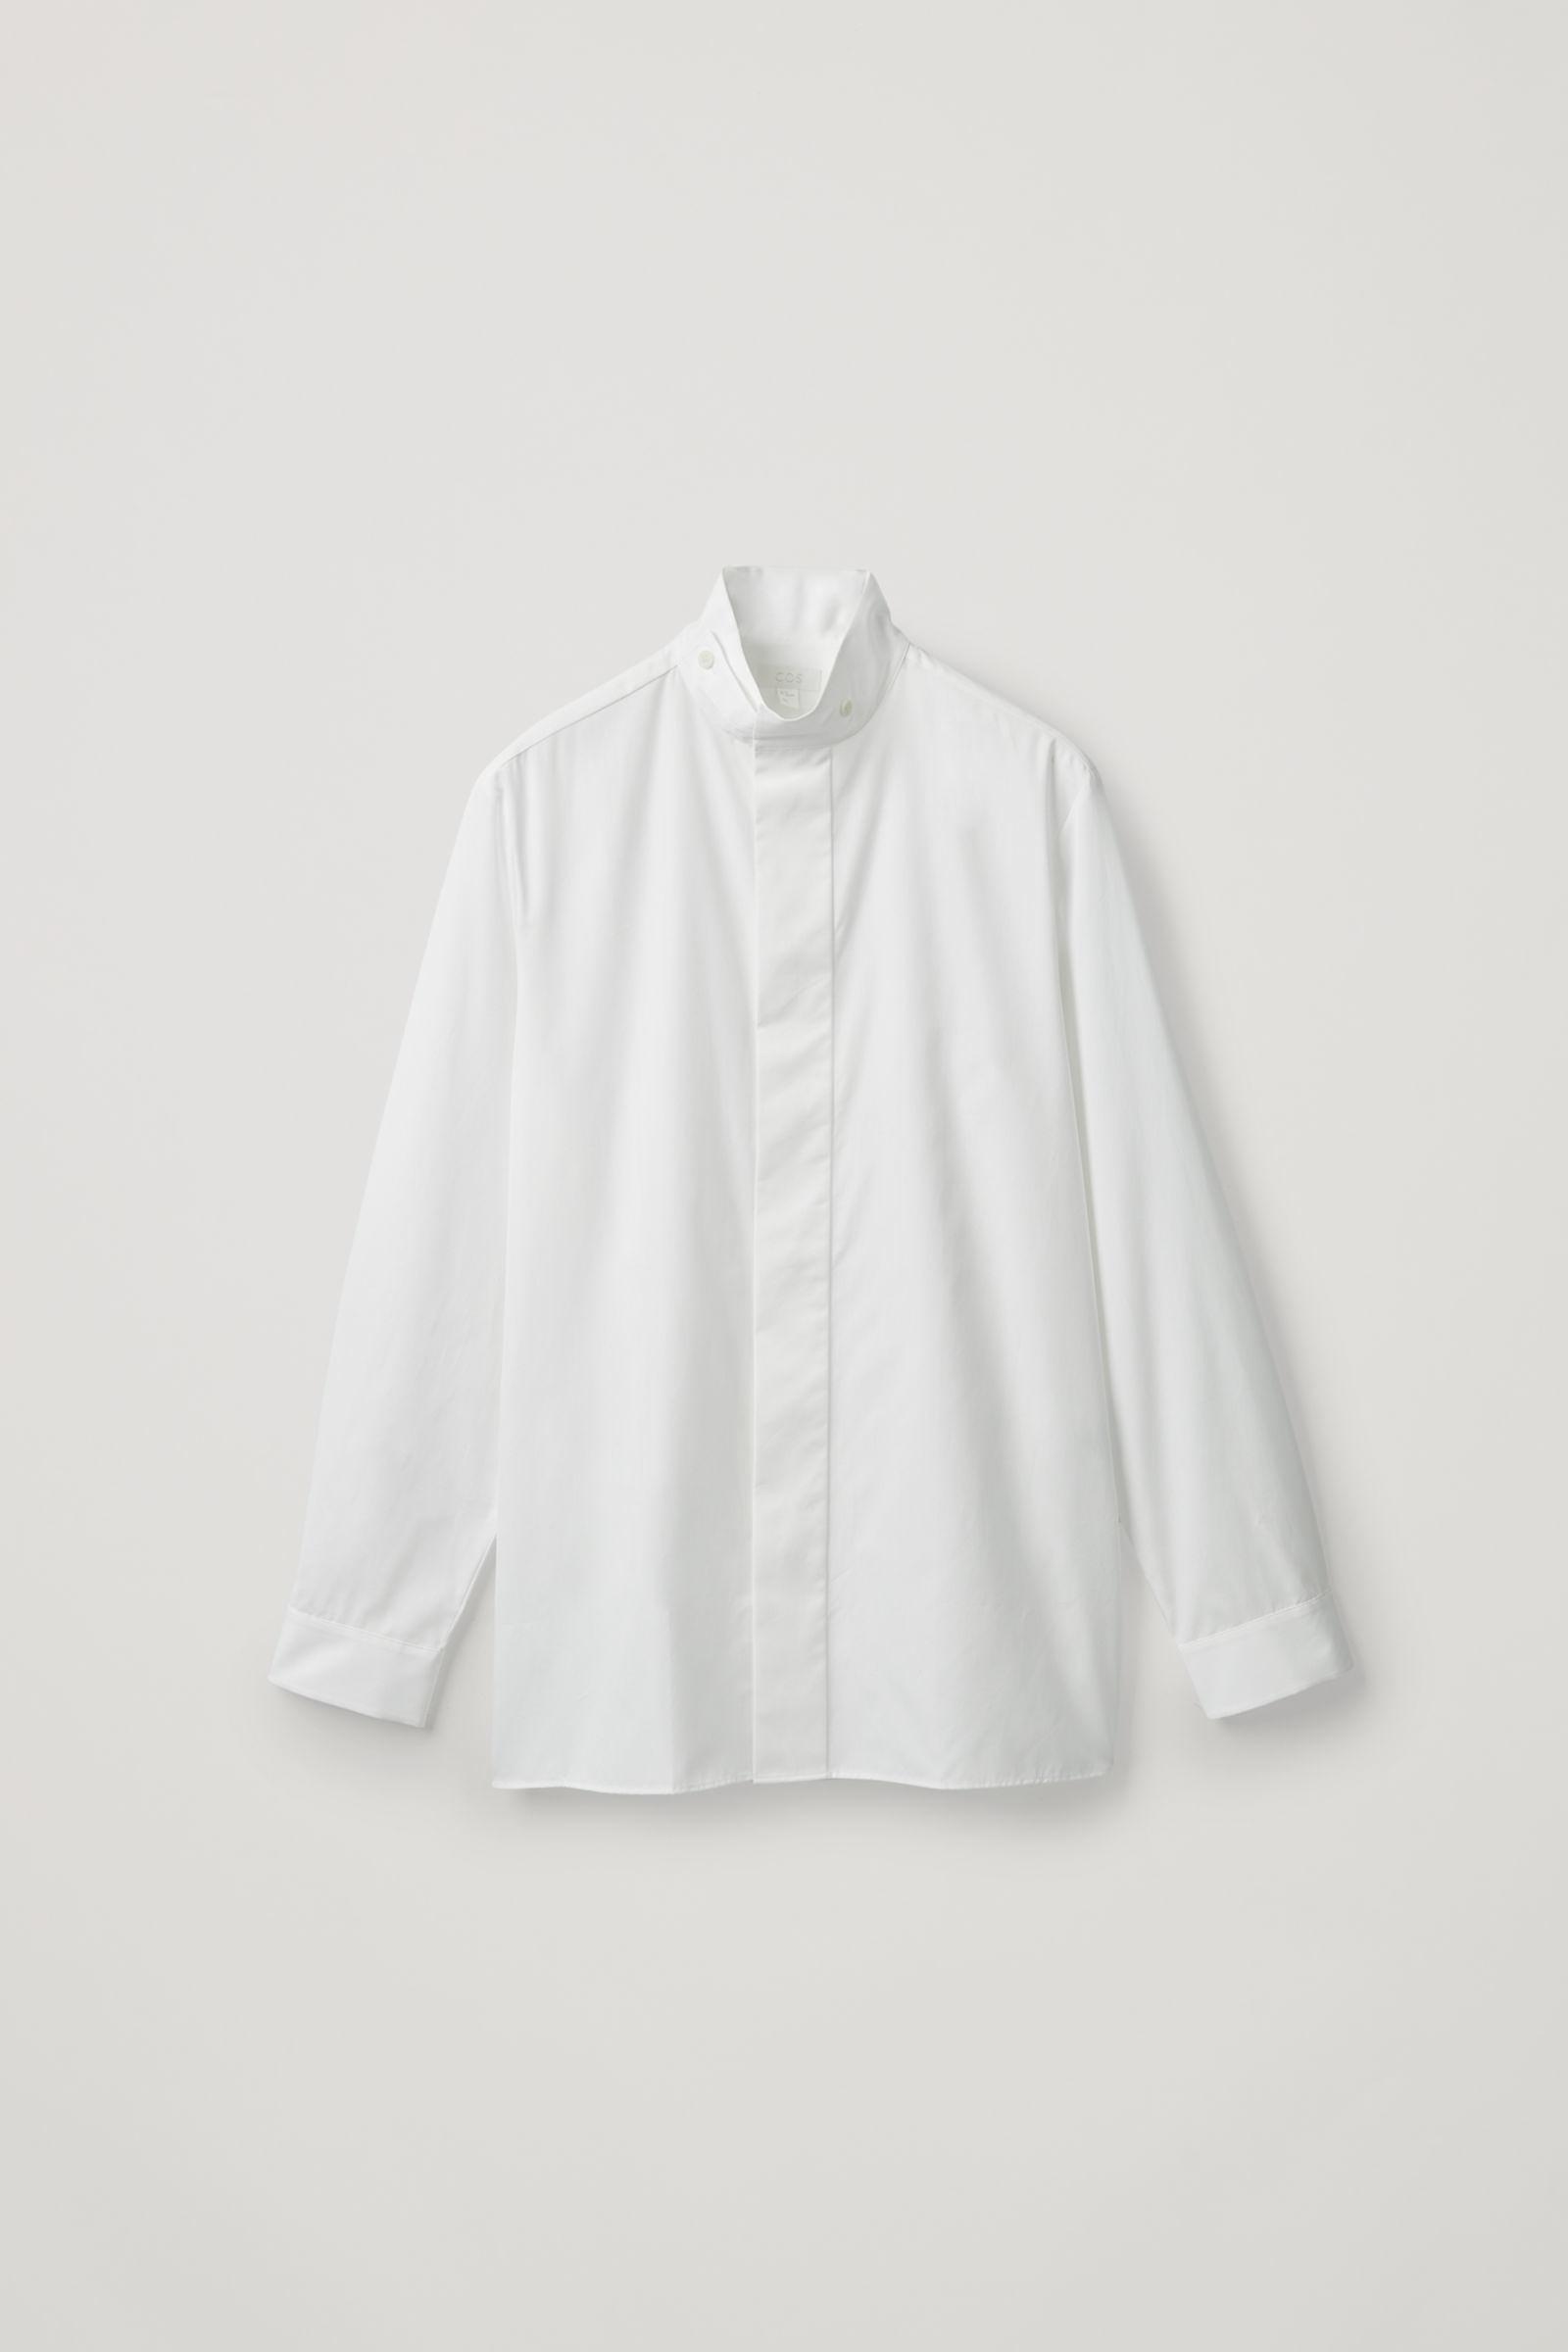 COS 퍼널 칼라 코튼 셔츠의 화이트컬러 Product입니다.